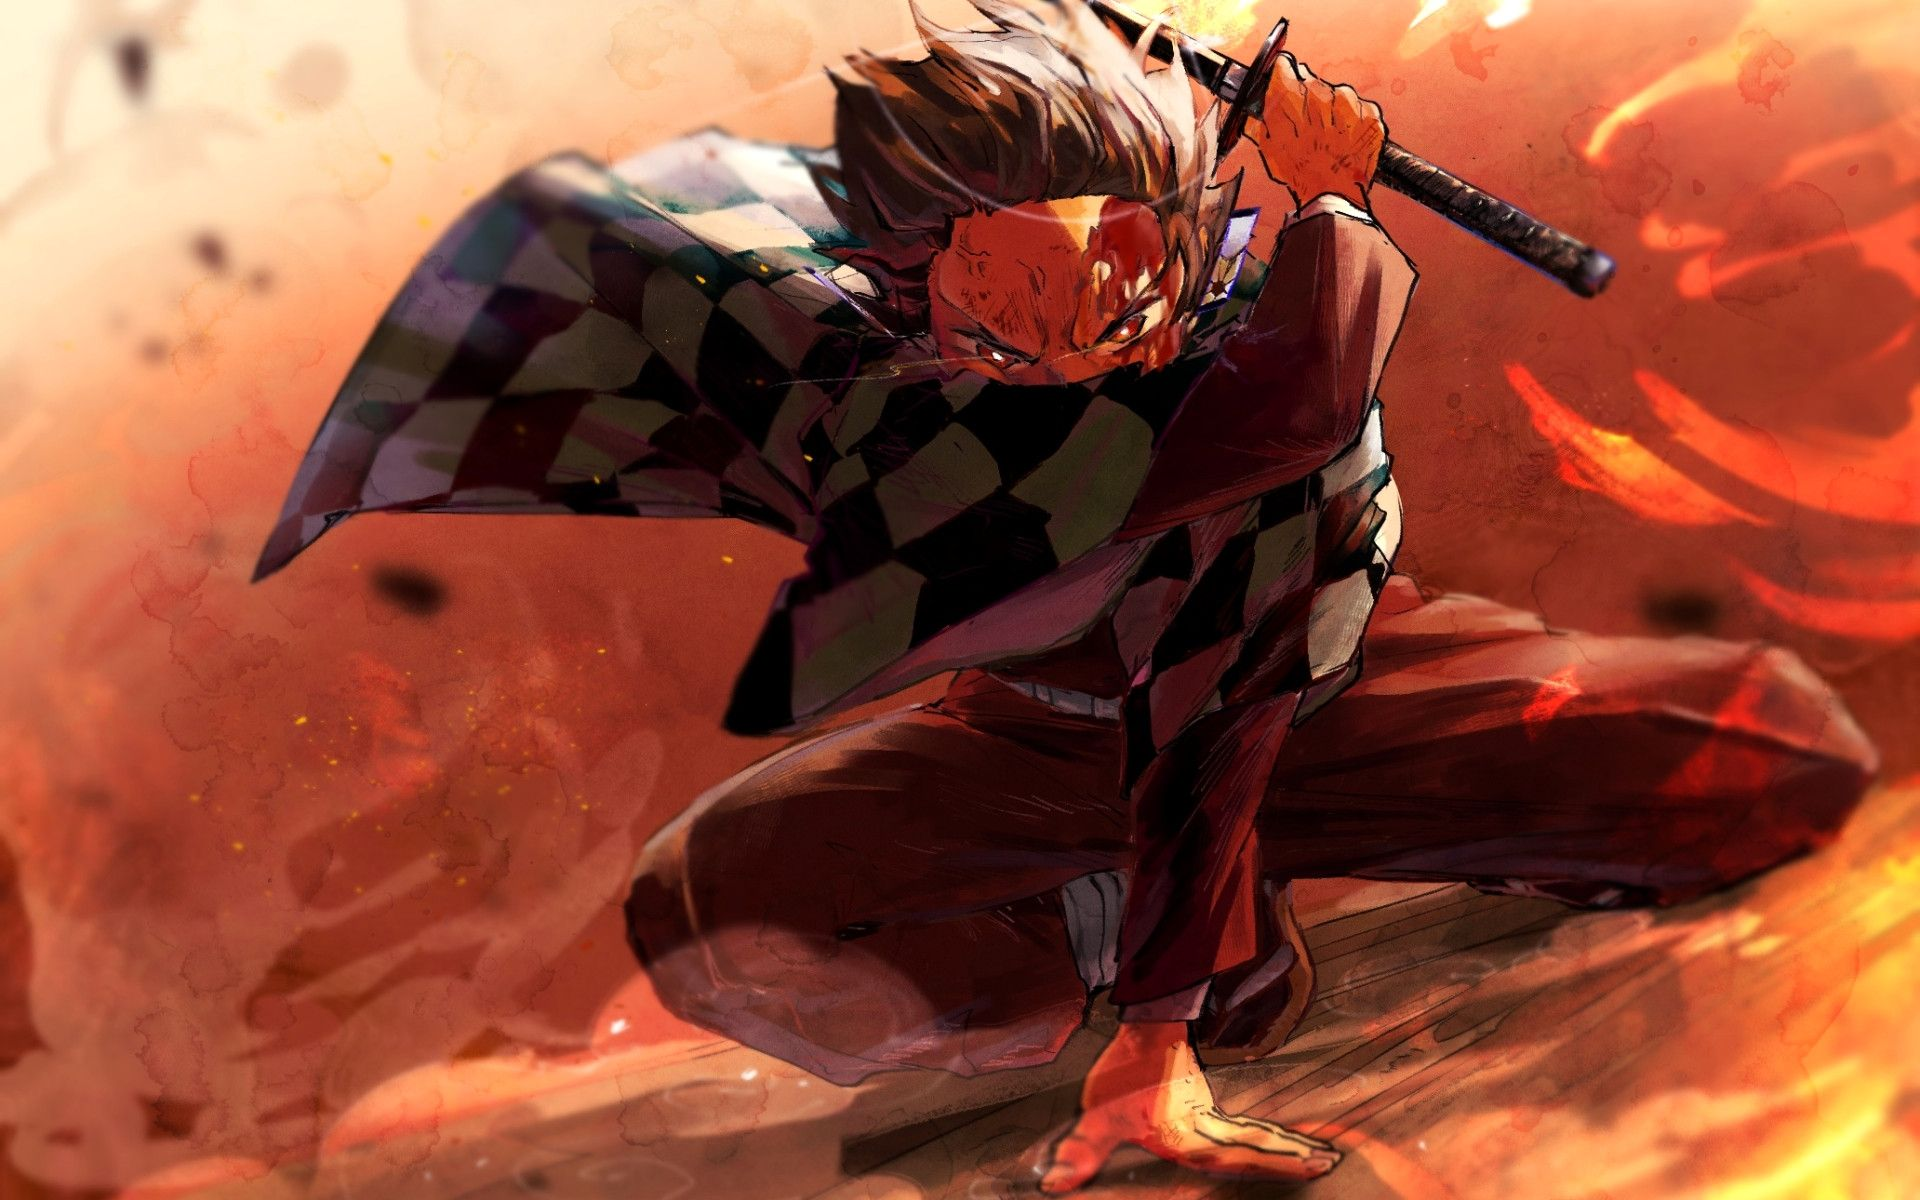 Lovely Wallpaper Of Demon Slayer Kimetsu No Yaiba Tanjirou Kamado Anime Fight Anime Wallpaper Anime Demon